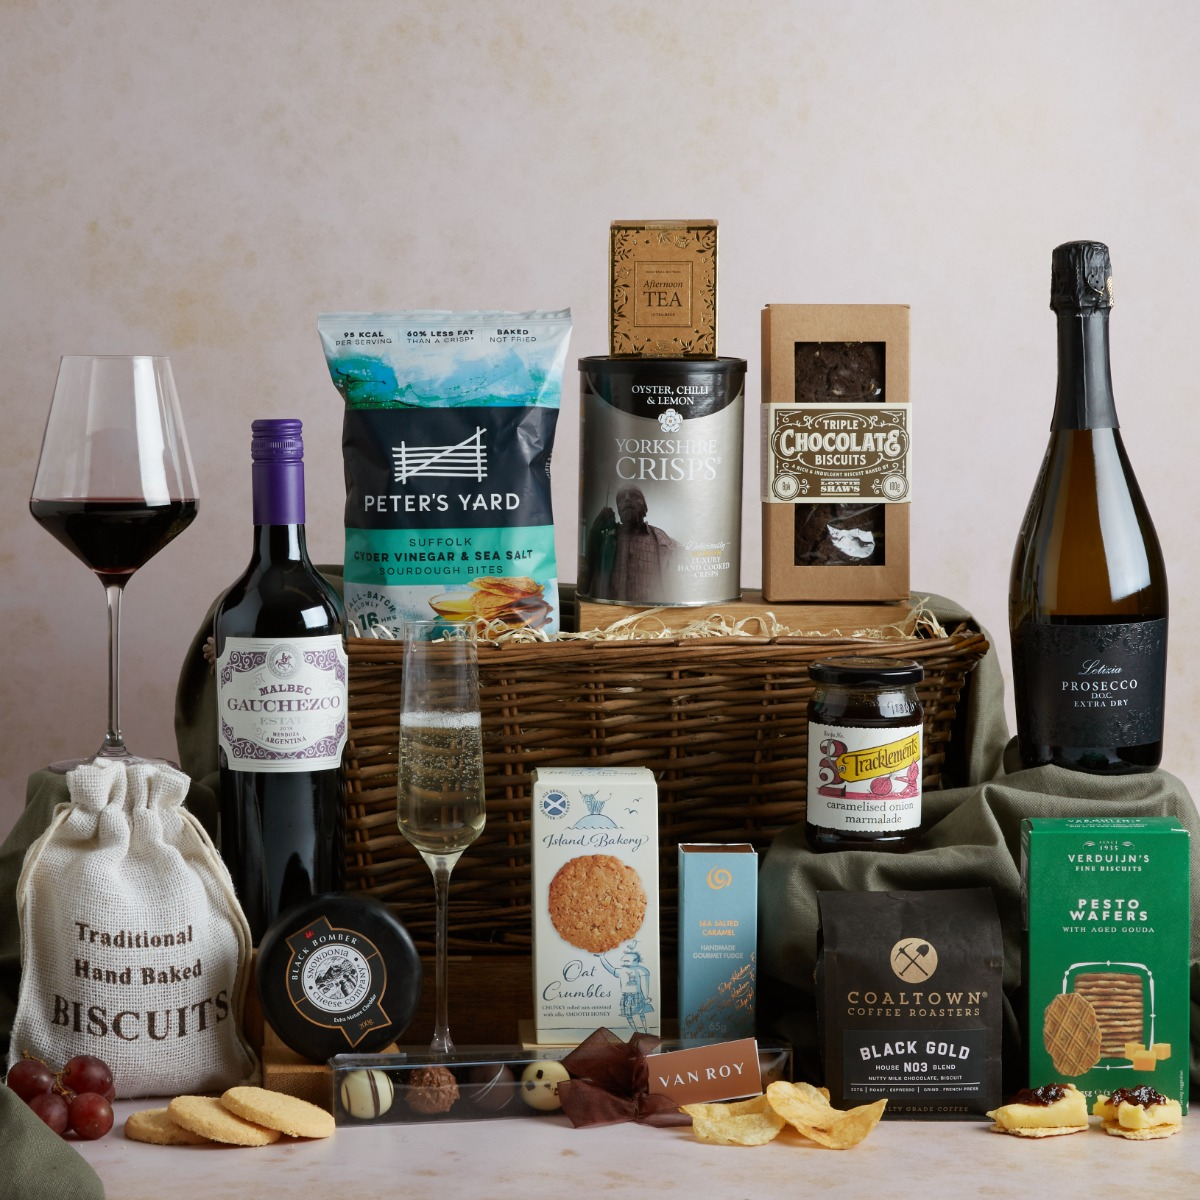 Luxury Food & Wine Basket Food and Wine Hampers Hampers.com